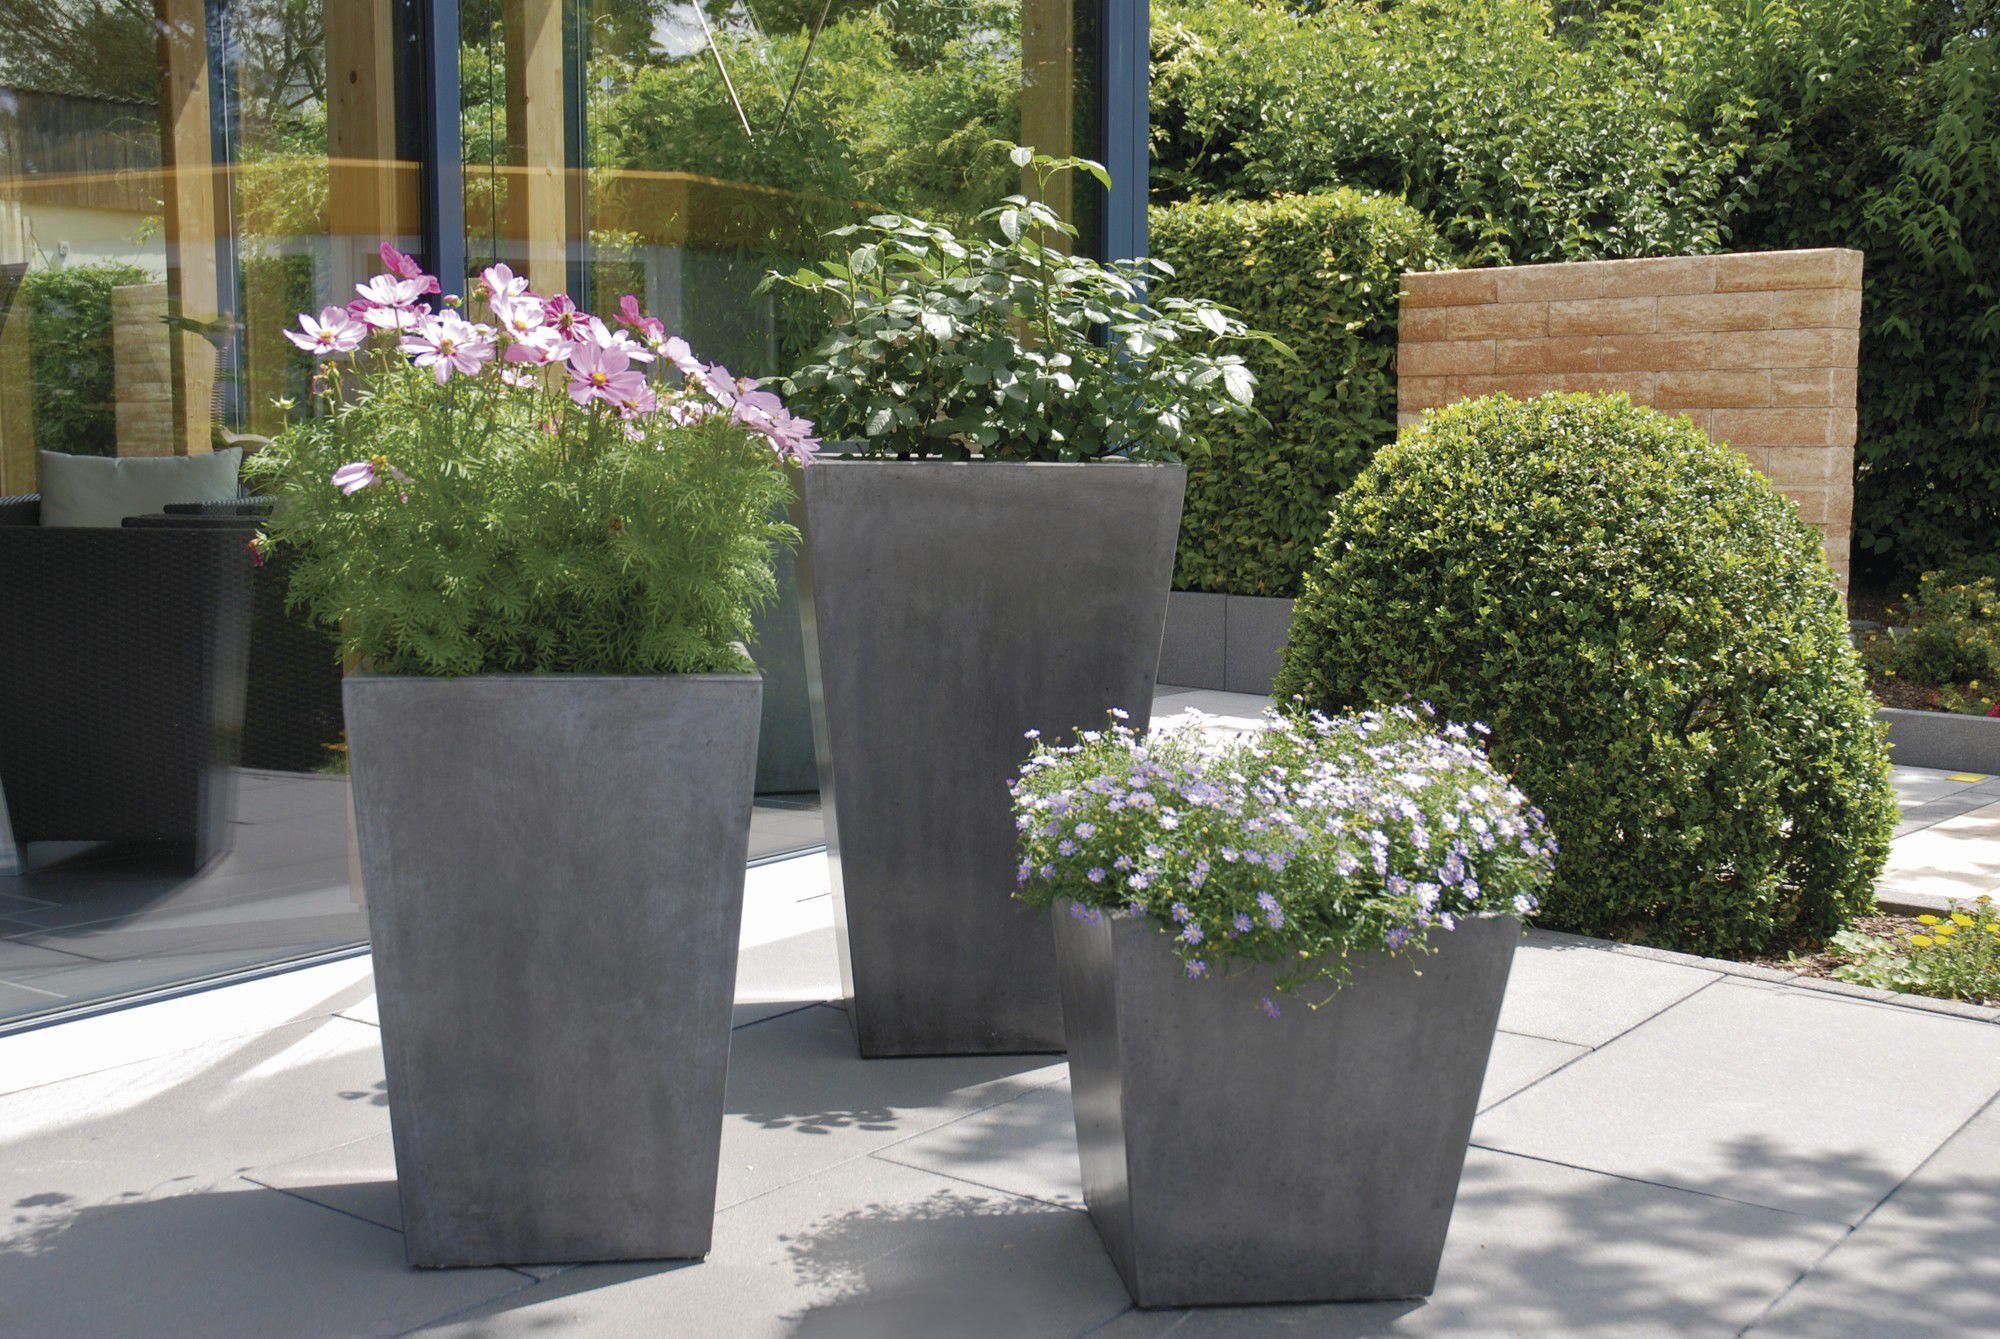 jardinire en pierre carre contemporaine vinci rinn beton und naturstein stadtroda - Jardiniere Exterieure Contemporaine